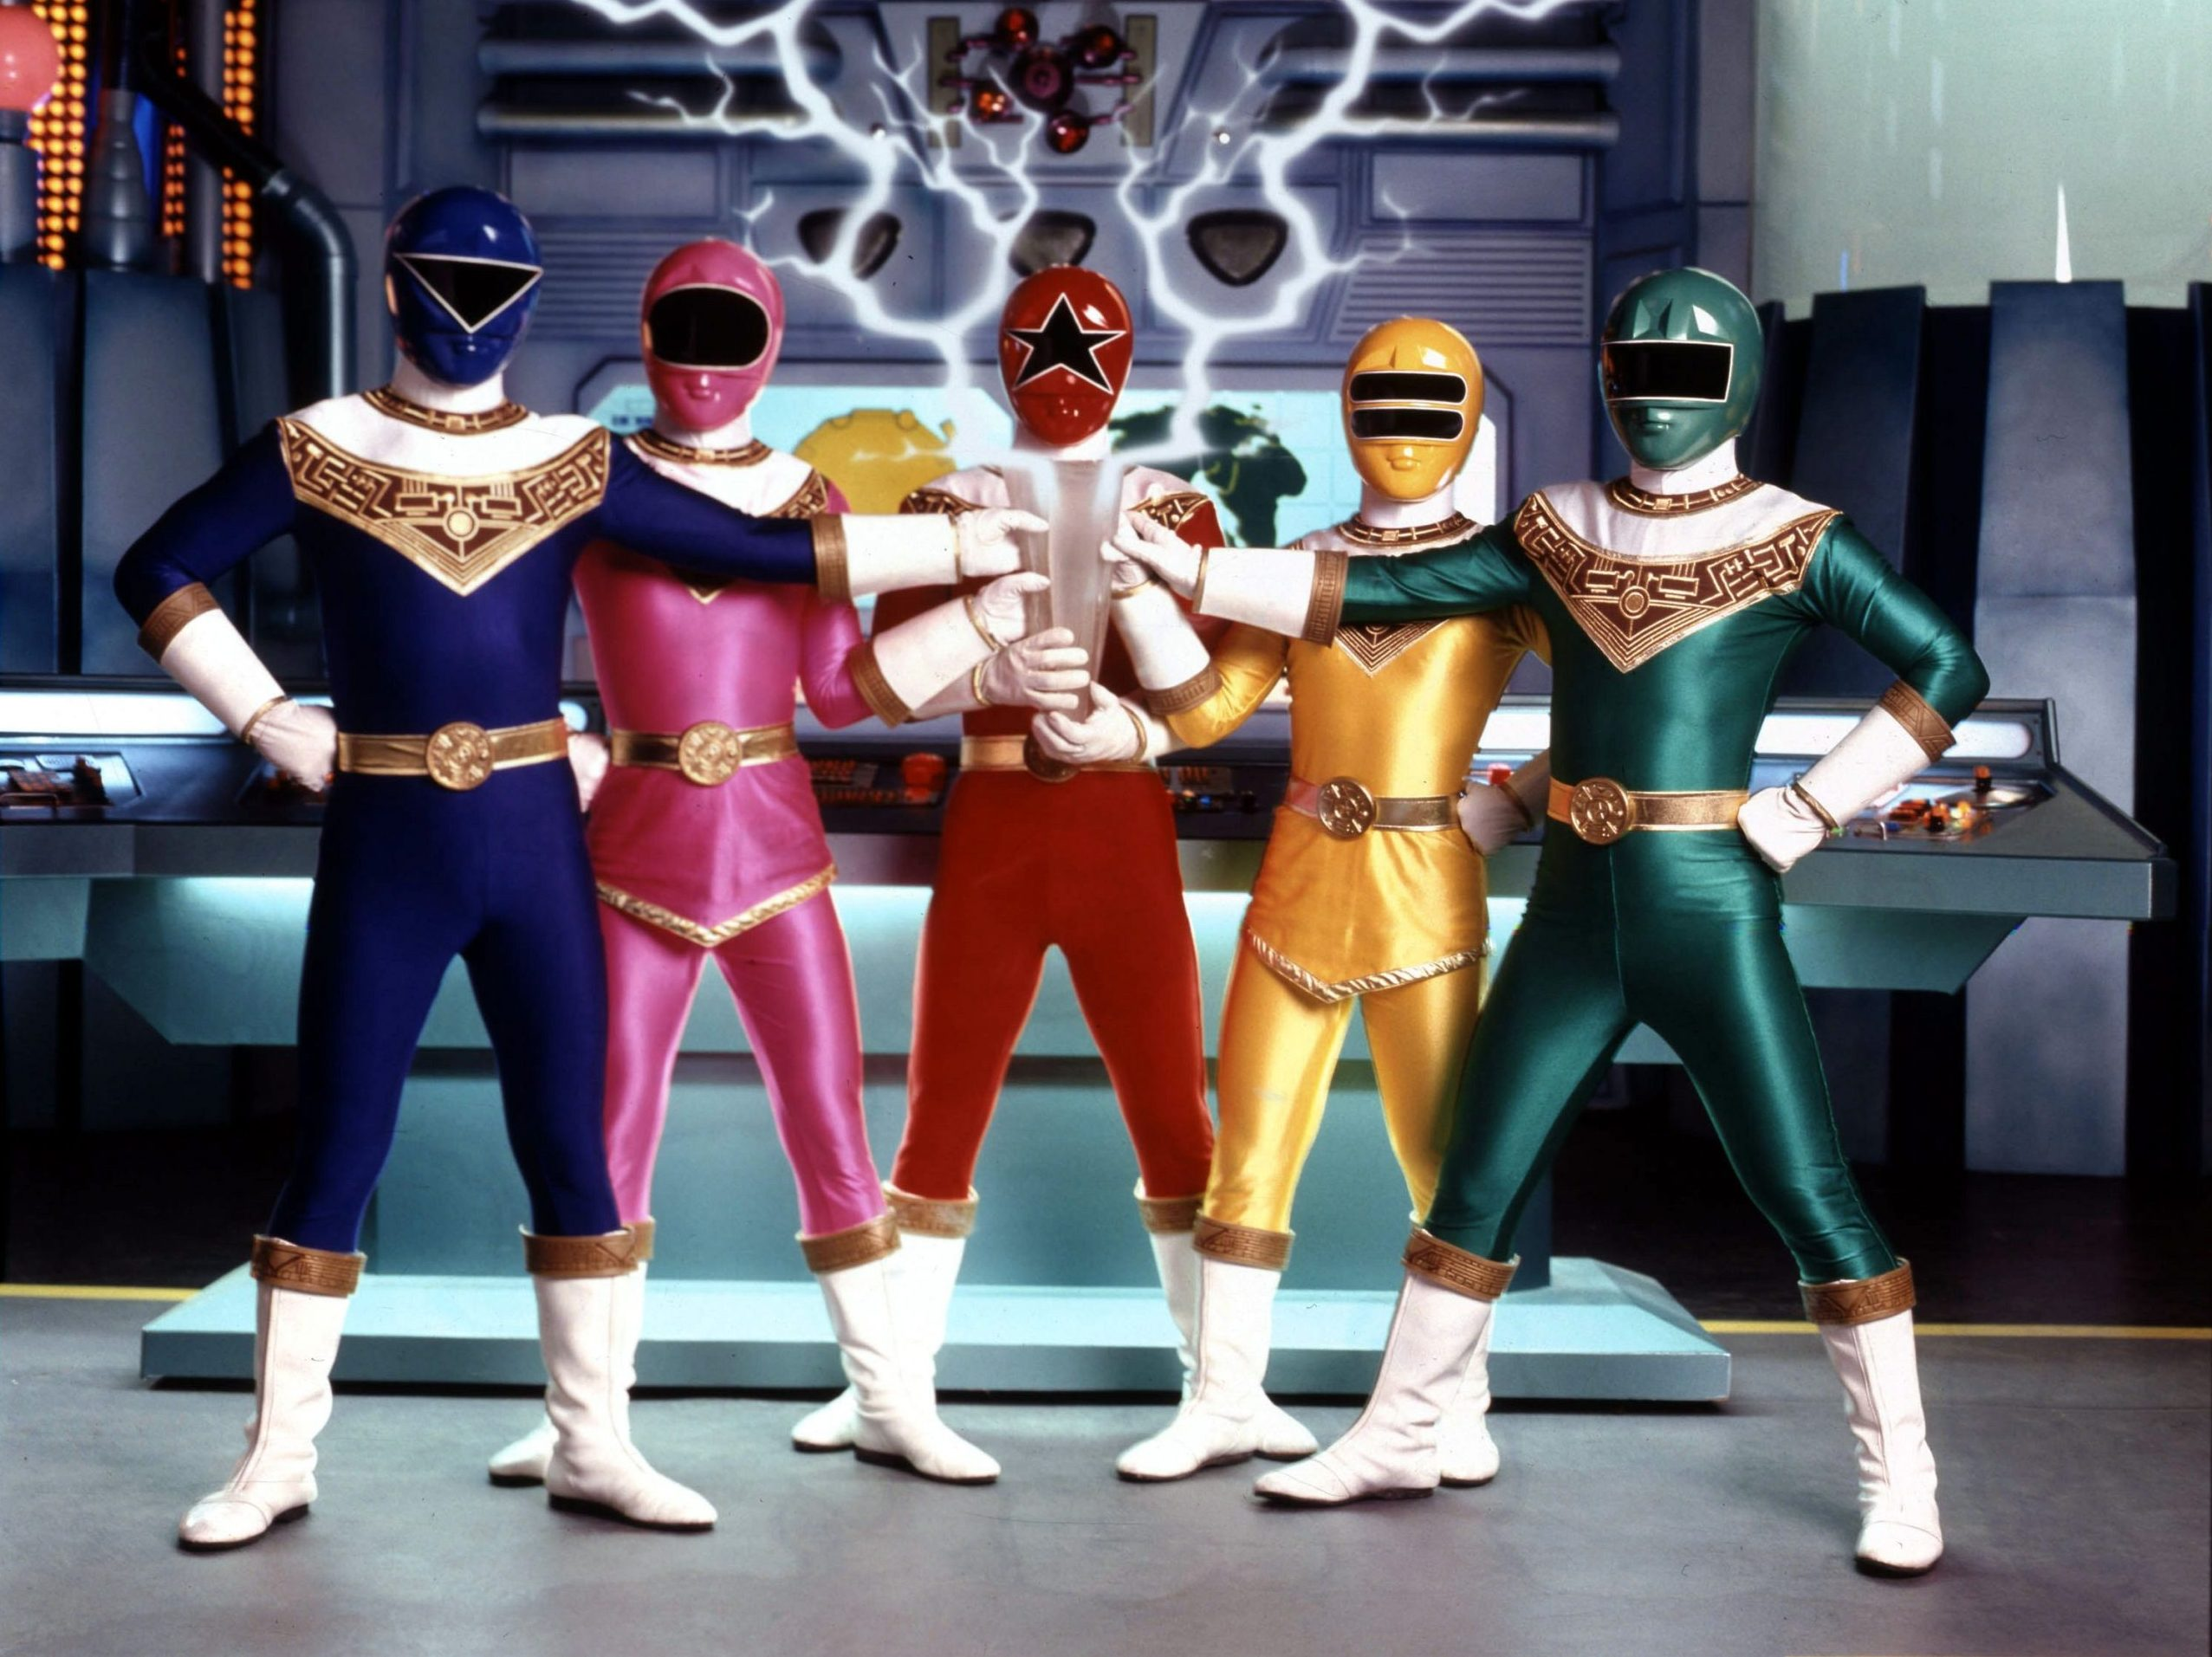 21e2740c494f8cfd3986a69a8a3348f1 scaled e1606300694715 20 High-Kicking Facts About Mighty Morphin Power Rangers